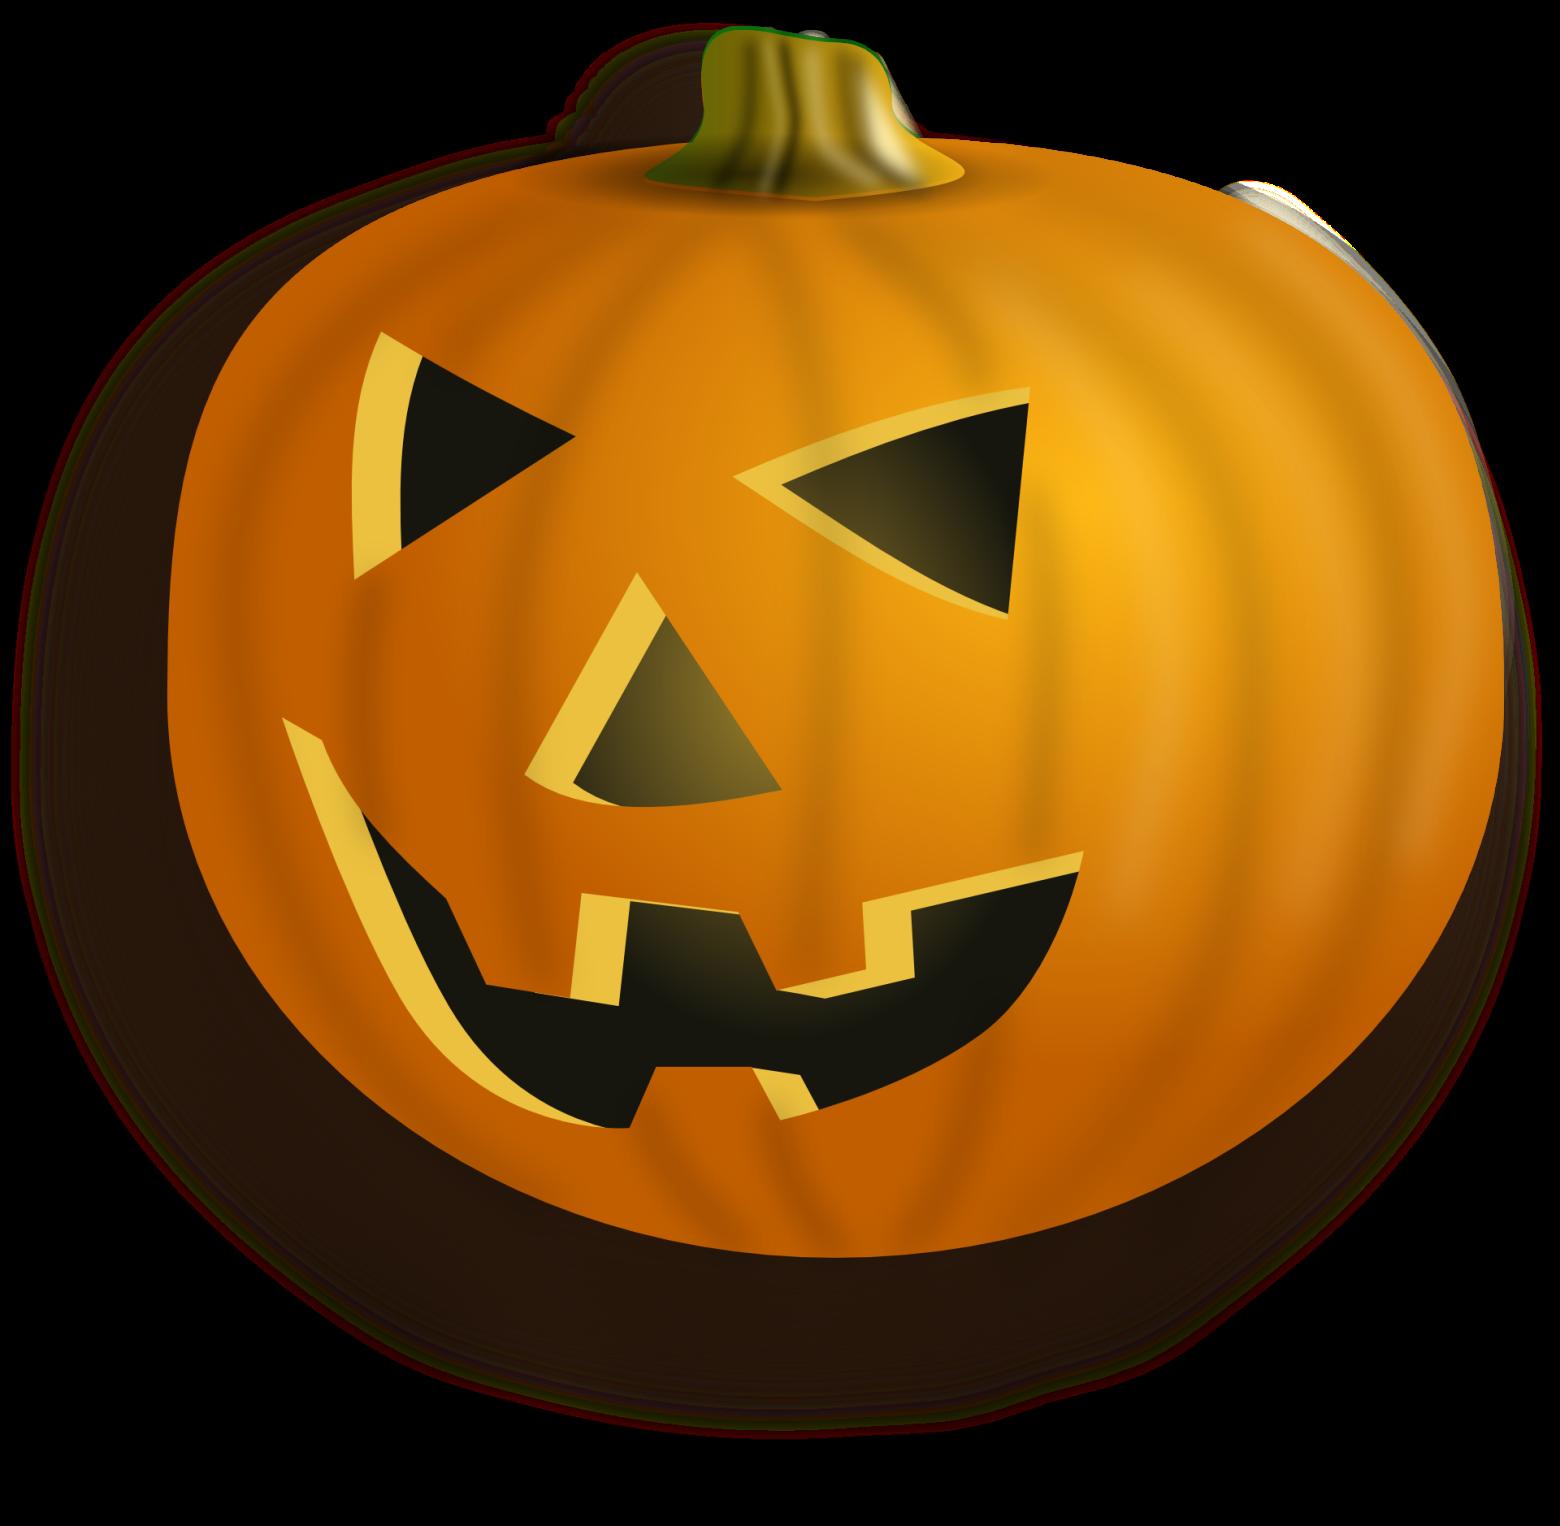 la citrouille cliparts halloween images gratuites libres de droits images gratuites et libres. Black Bedroom Furniture Sets. Home Design Ideas